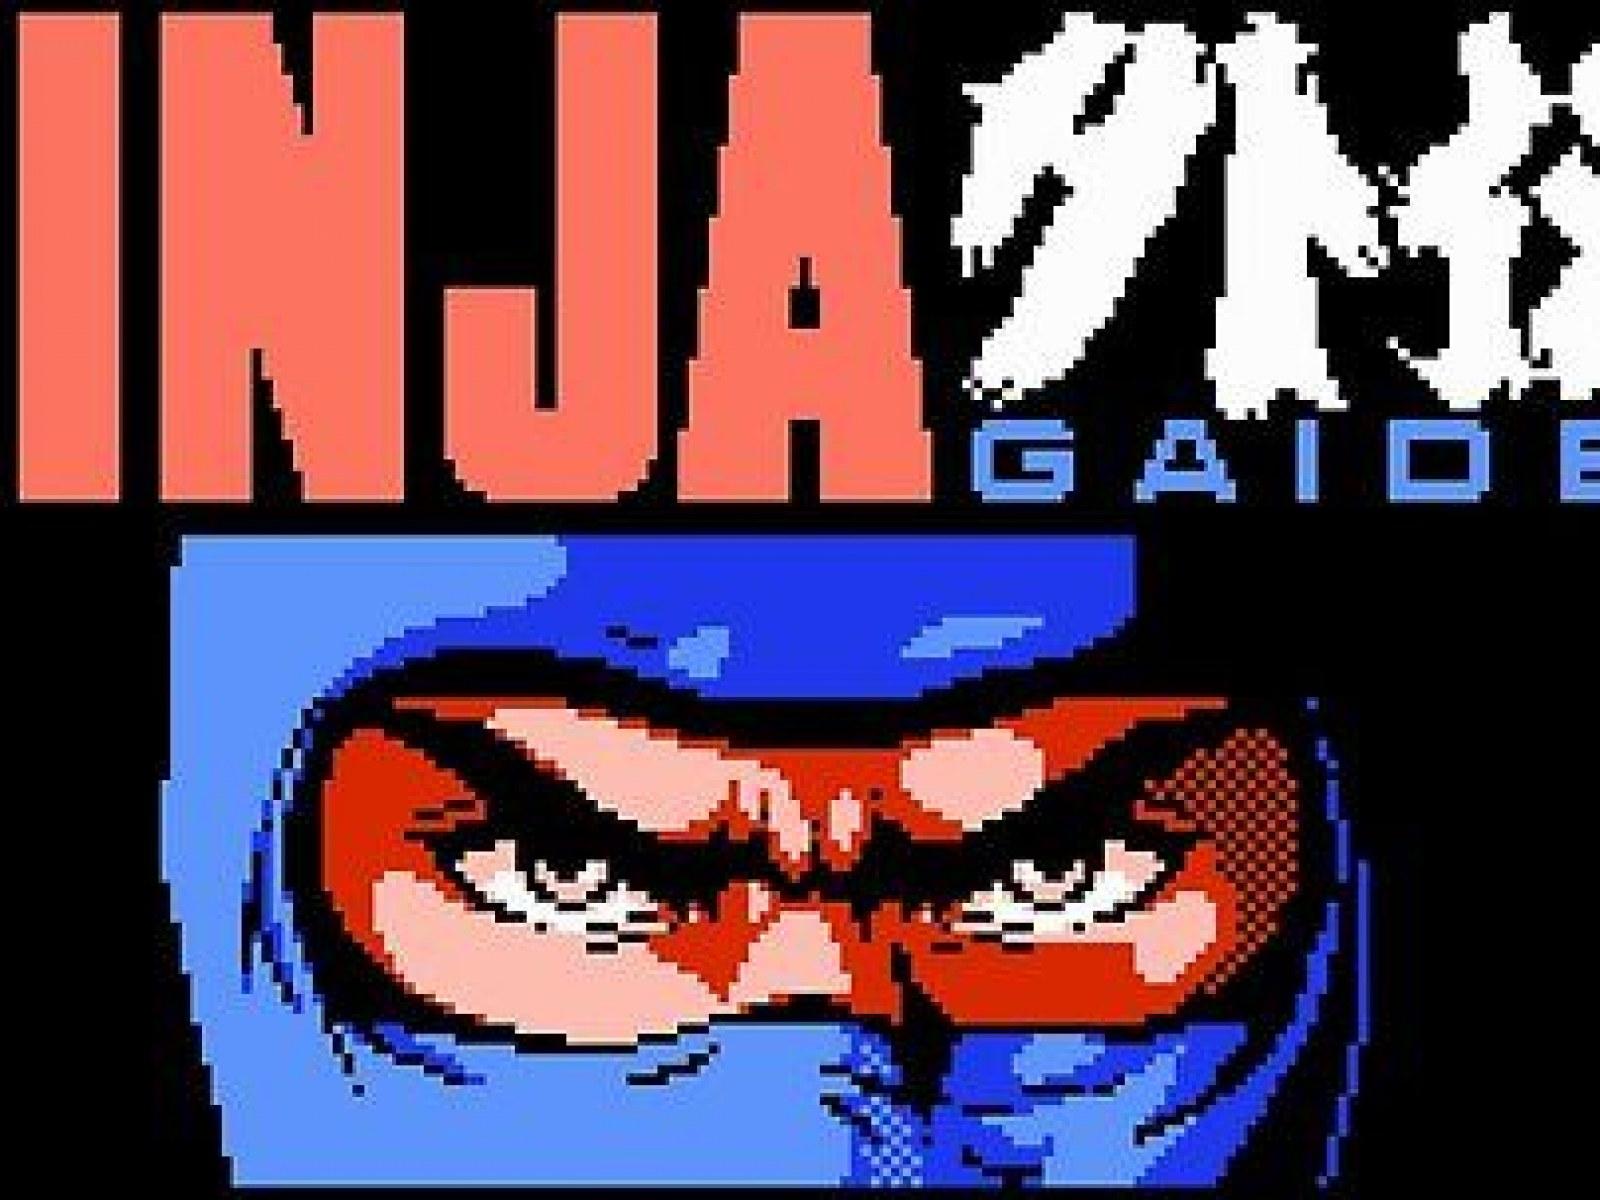 Nintendo Switch Online Update Brings Ninja Gaiden And More In